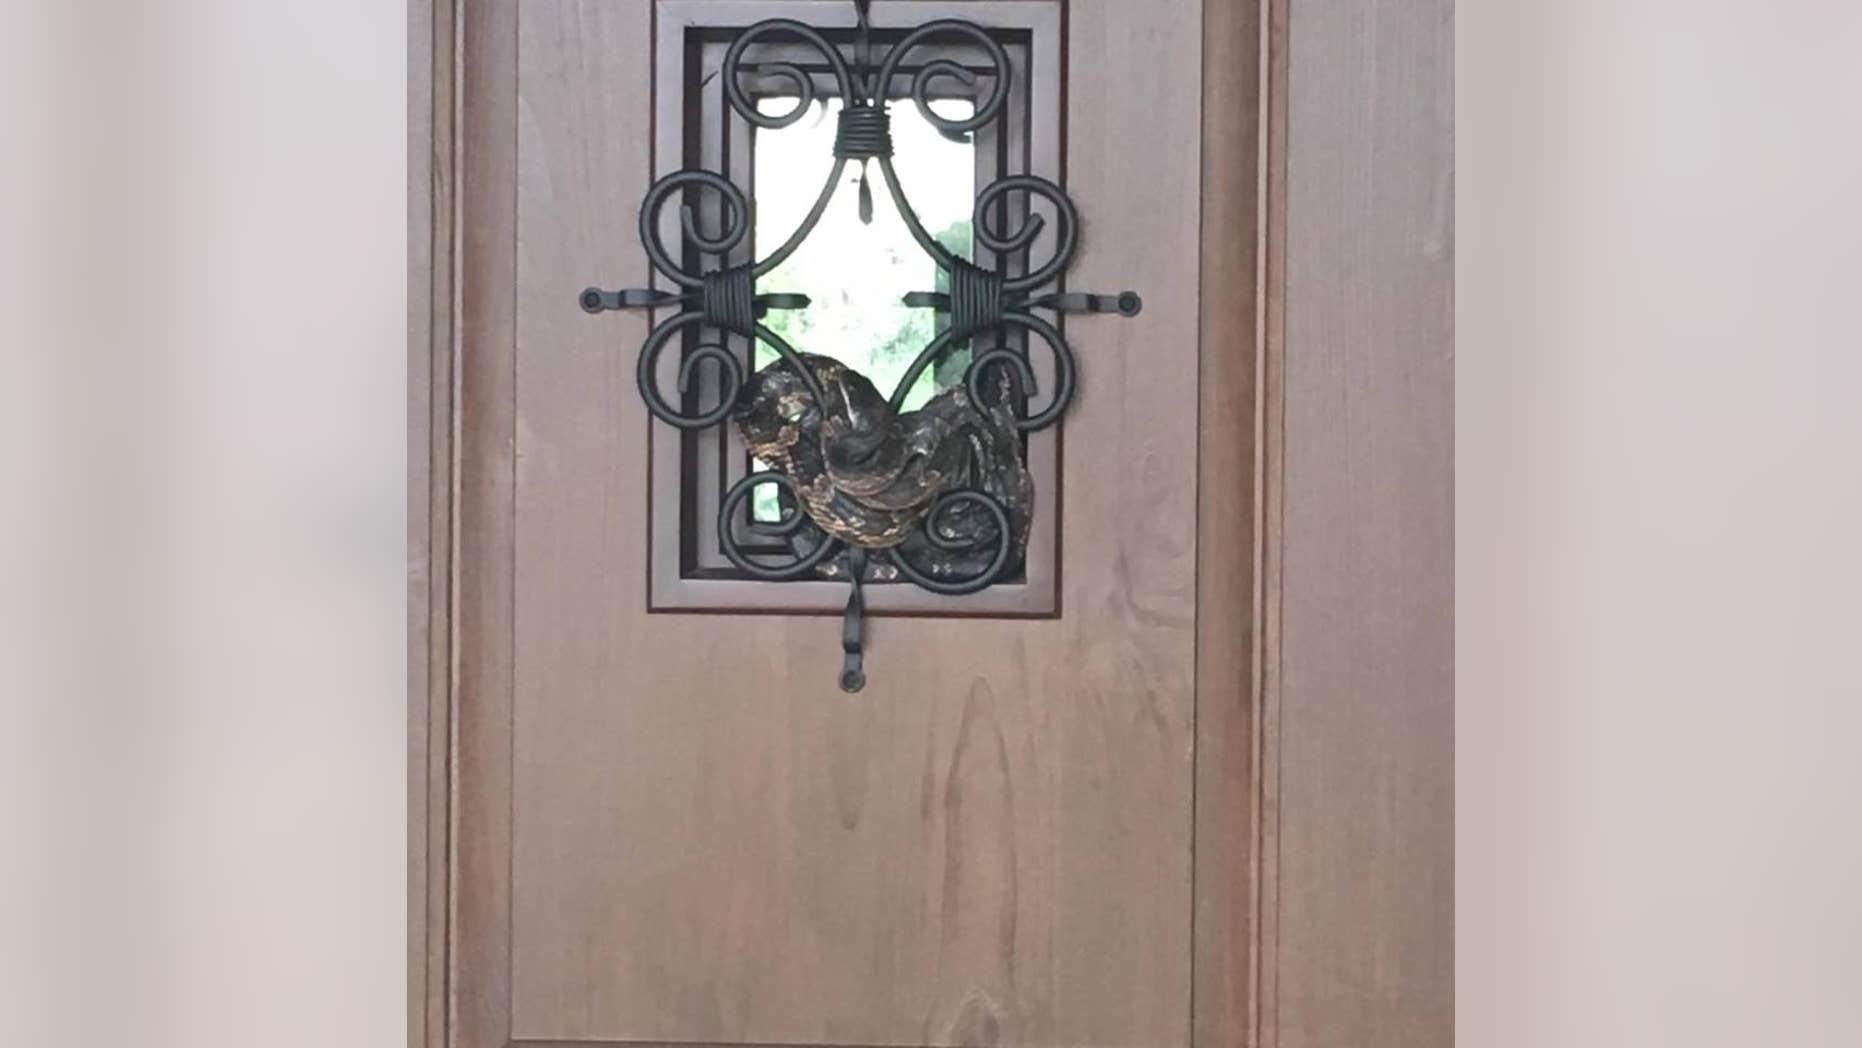 A 7-foot Texas rat snake wraps itself around a front door grille.